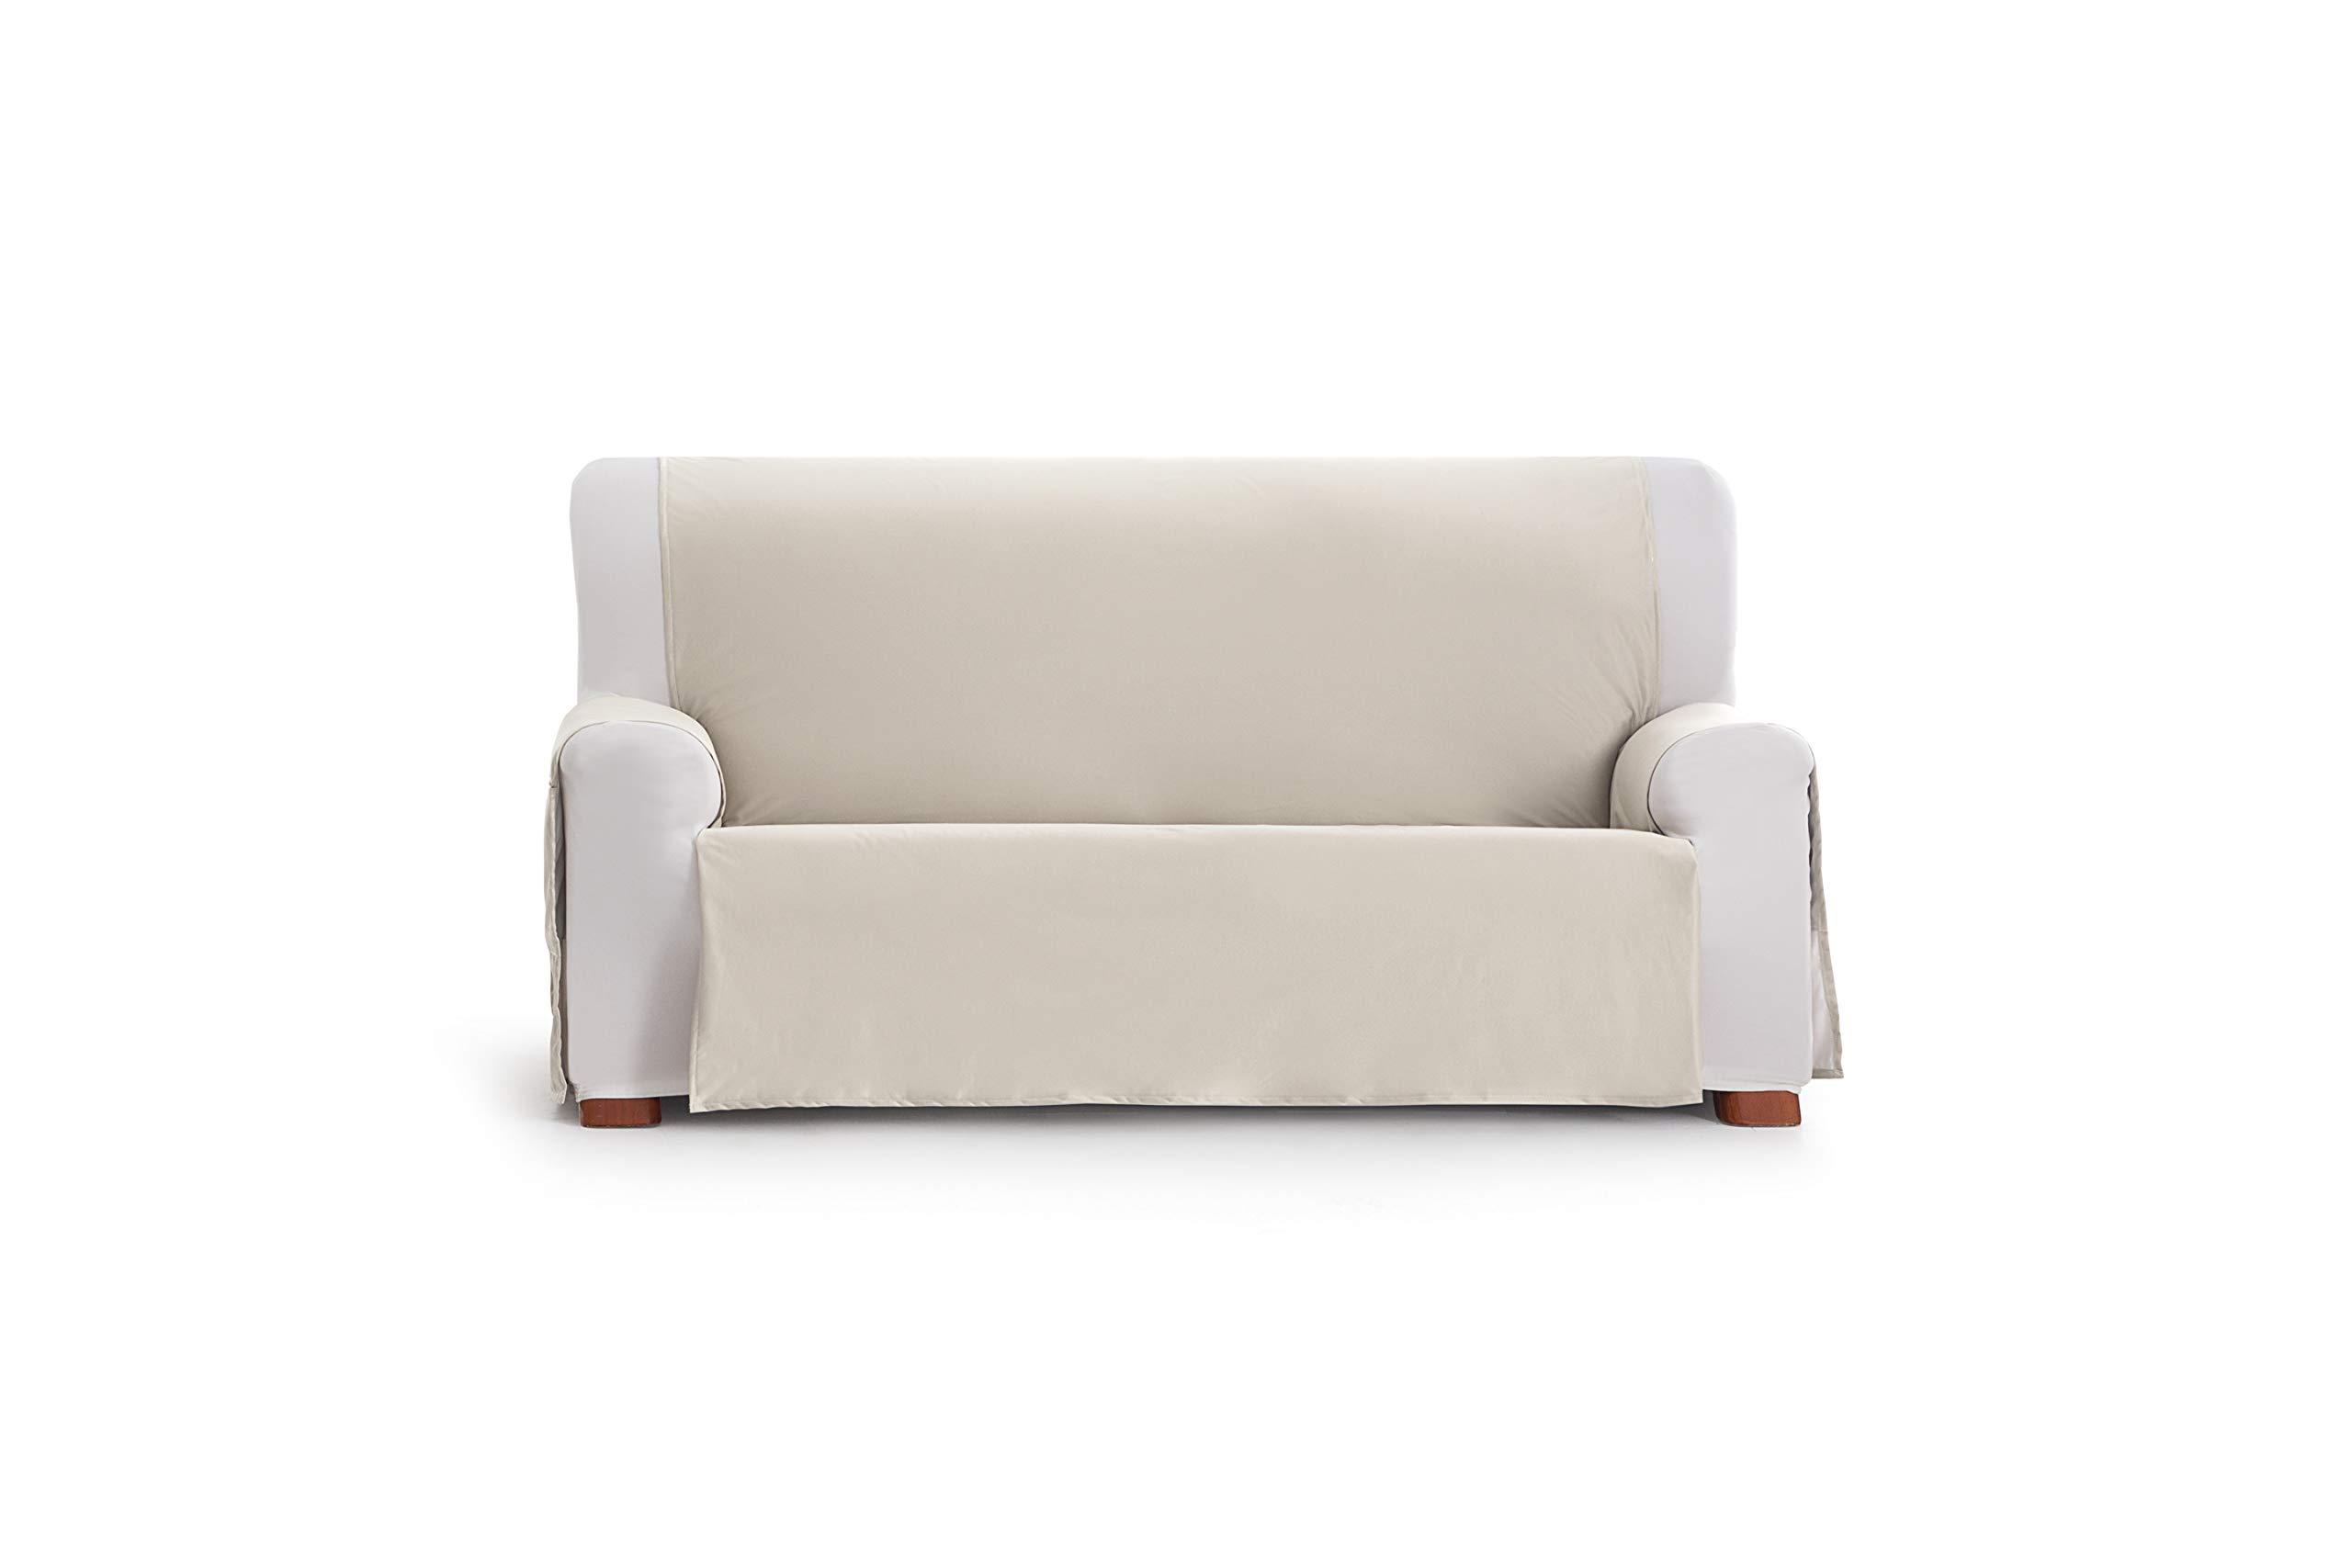 Eysa Somme Protect Funda de sofá, 100% Poliester, 11/Beige, 2 plazas: Amazon.es: Hogar